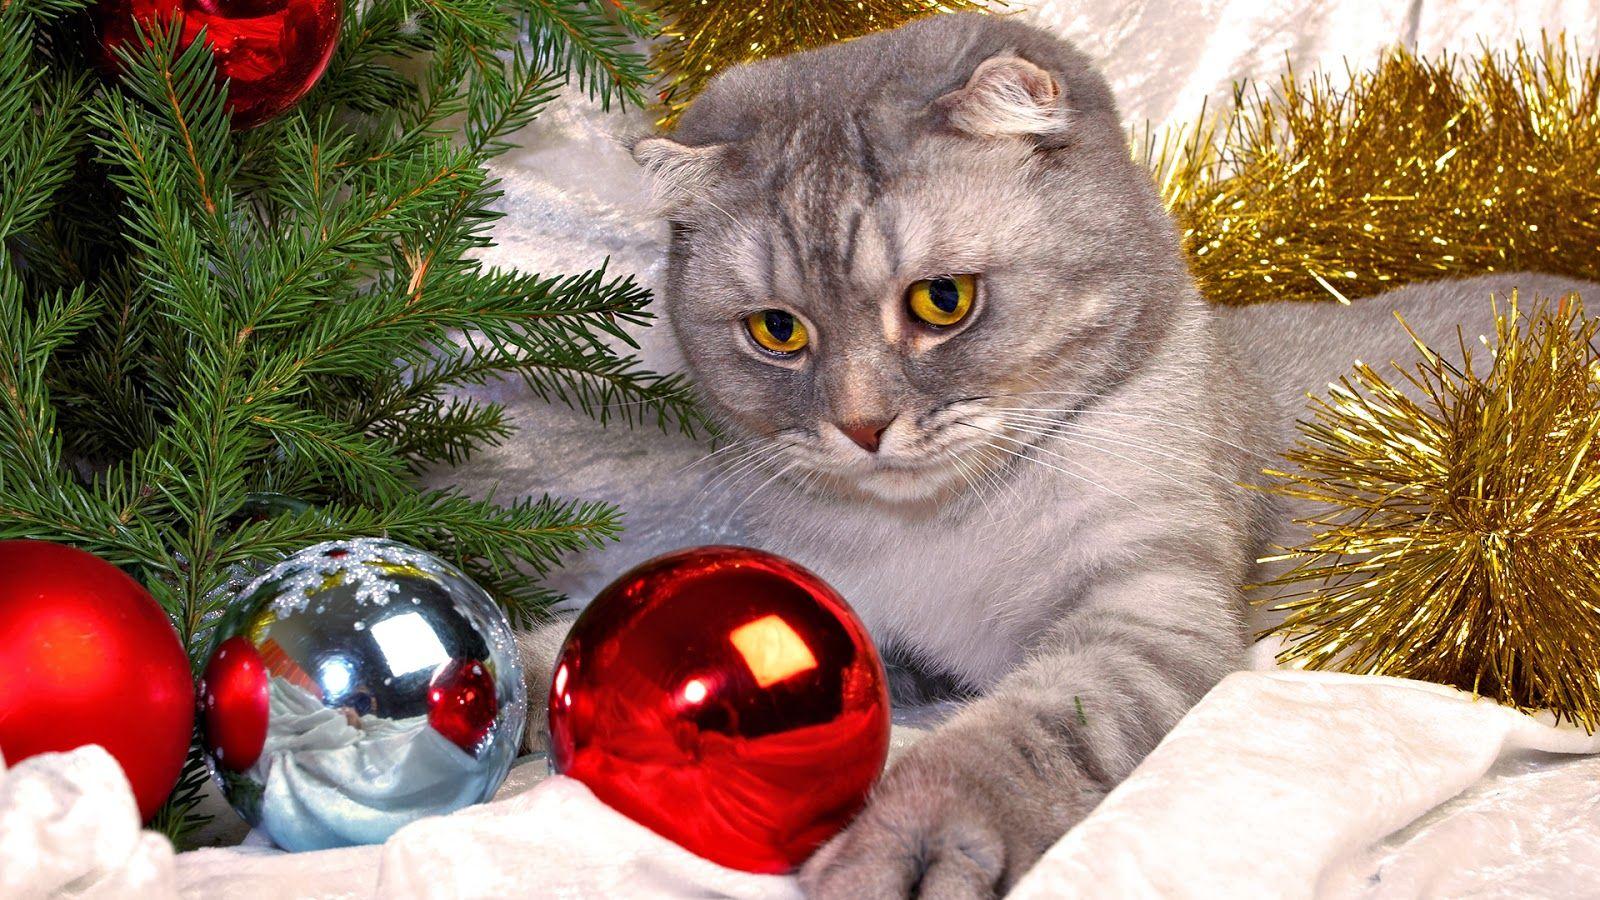 Hd Kitten Christmas Wallpapers Hd Wallpapers Blog Bring